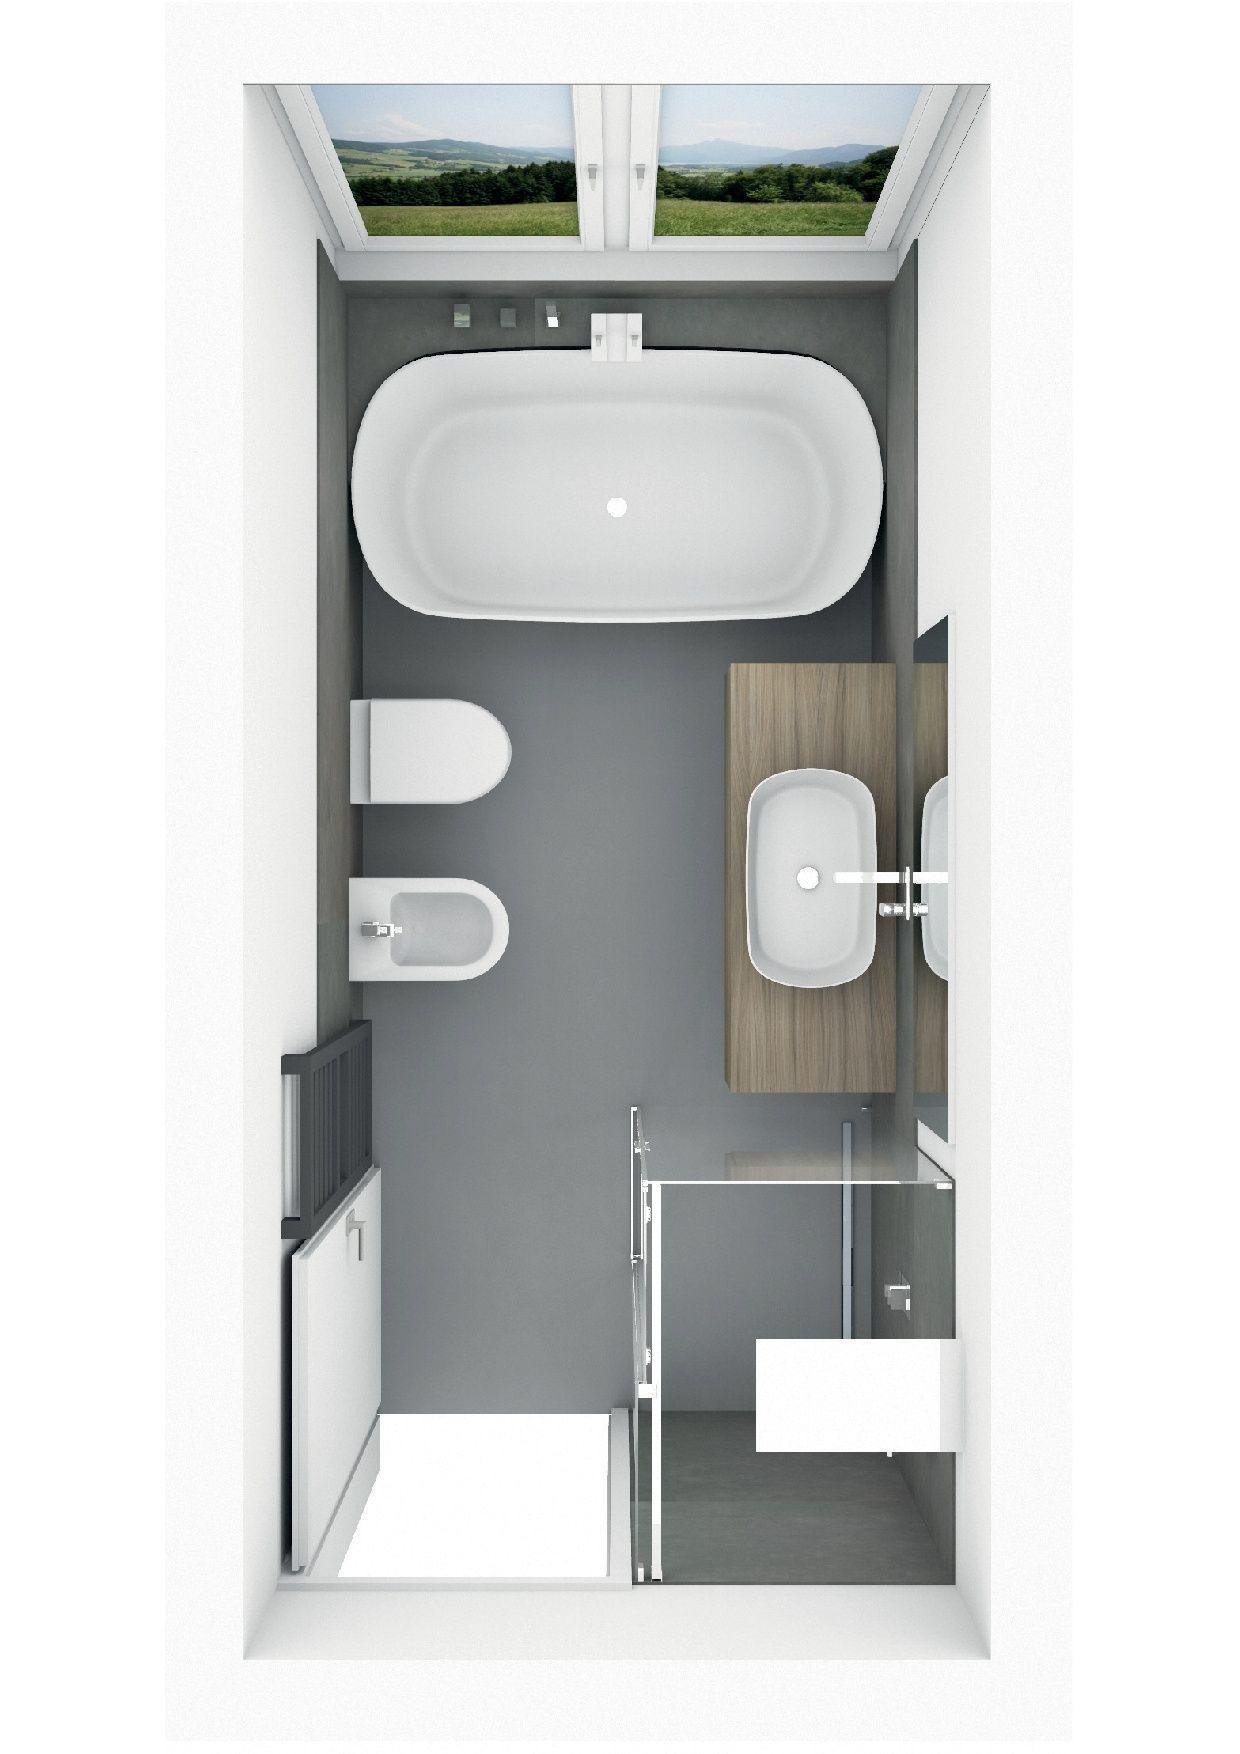 Zen Bathroom Decor Badplanung Mit Freistehender Badewanne Mit Ablage Ablage Badewanne In 2020 Bathroom With Shower And Bath Bathroom Design Small Bathroom Interior